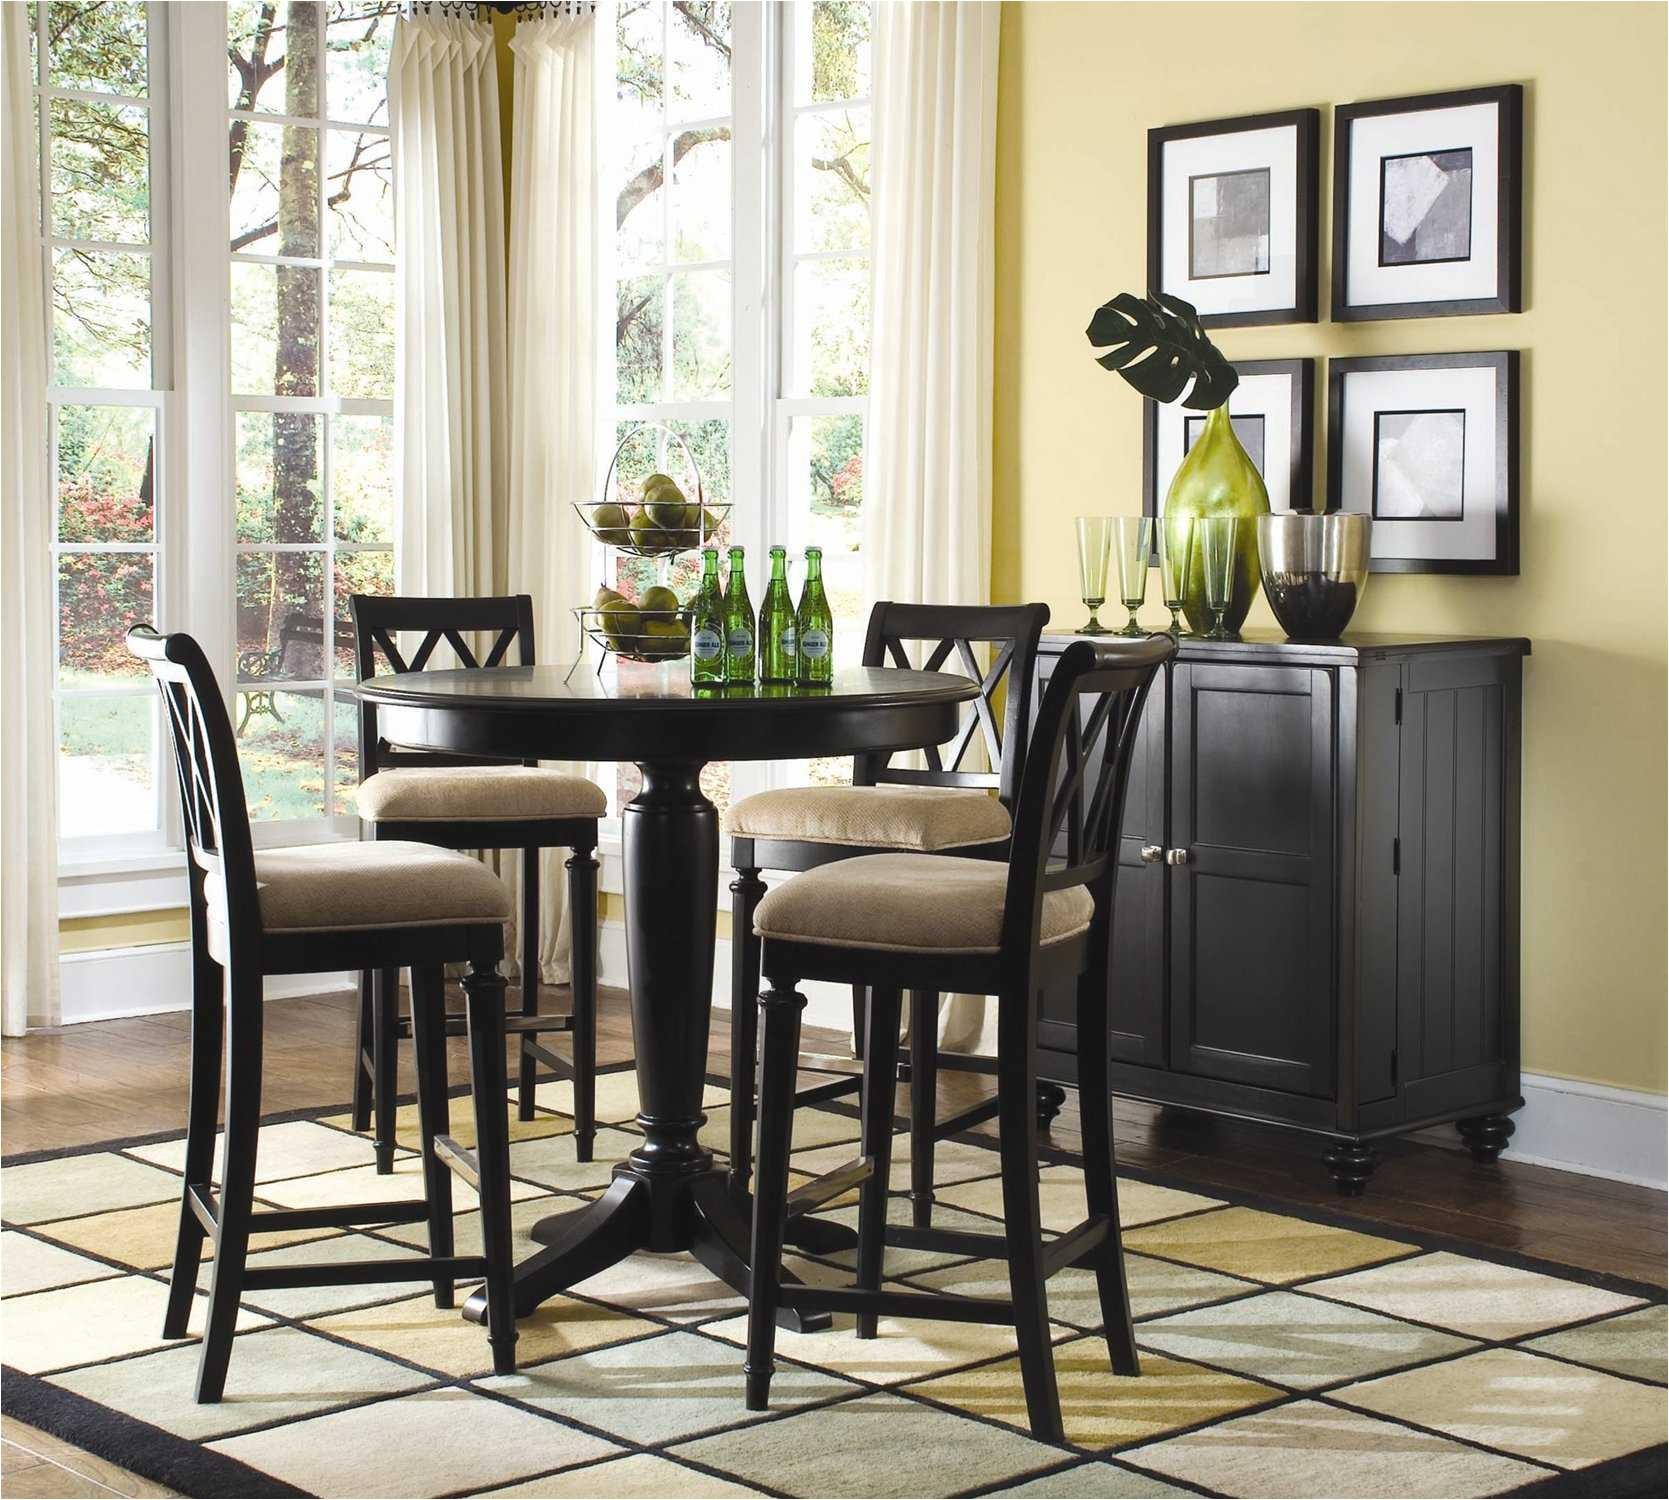 american drew camden ark casual bar dining room set ad919706691582